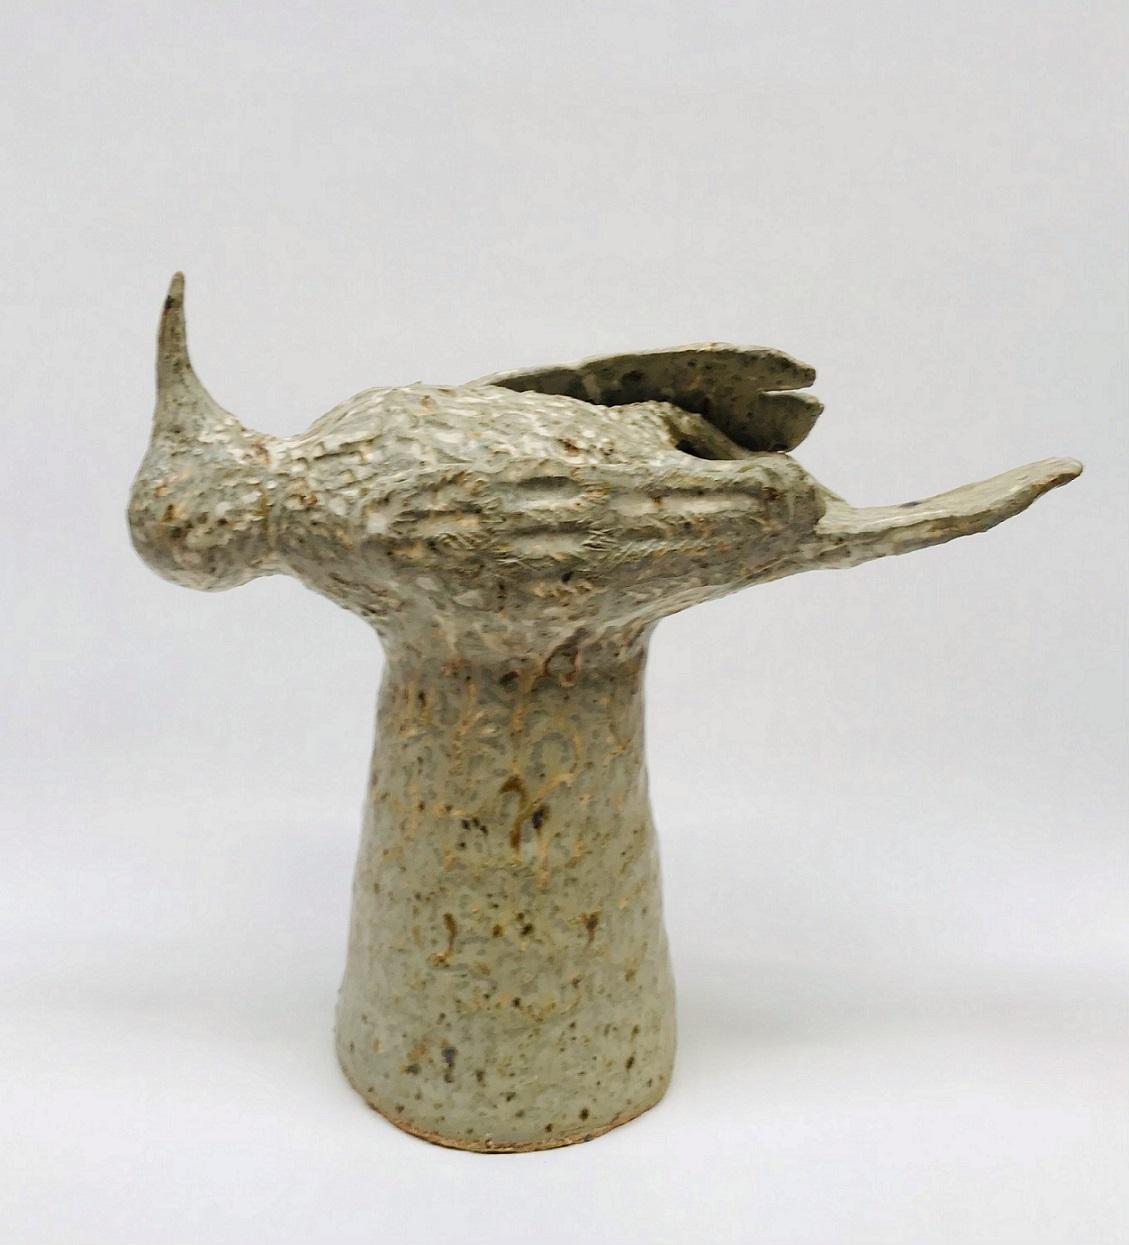 Post mortem wattlebird